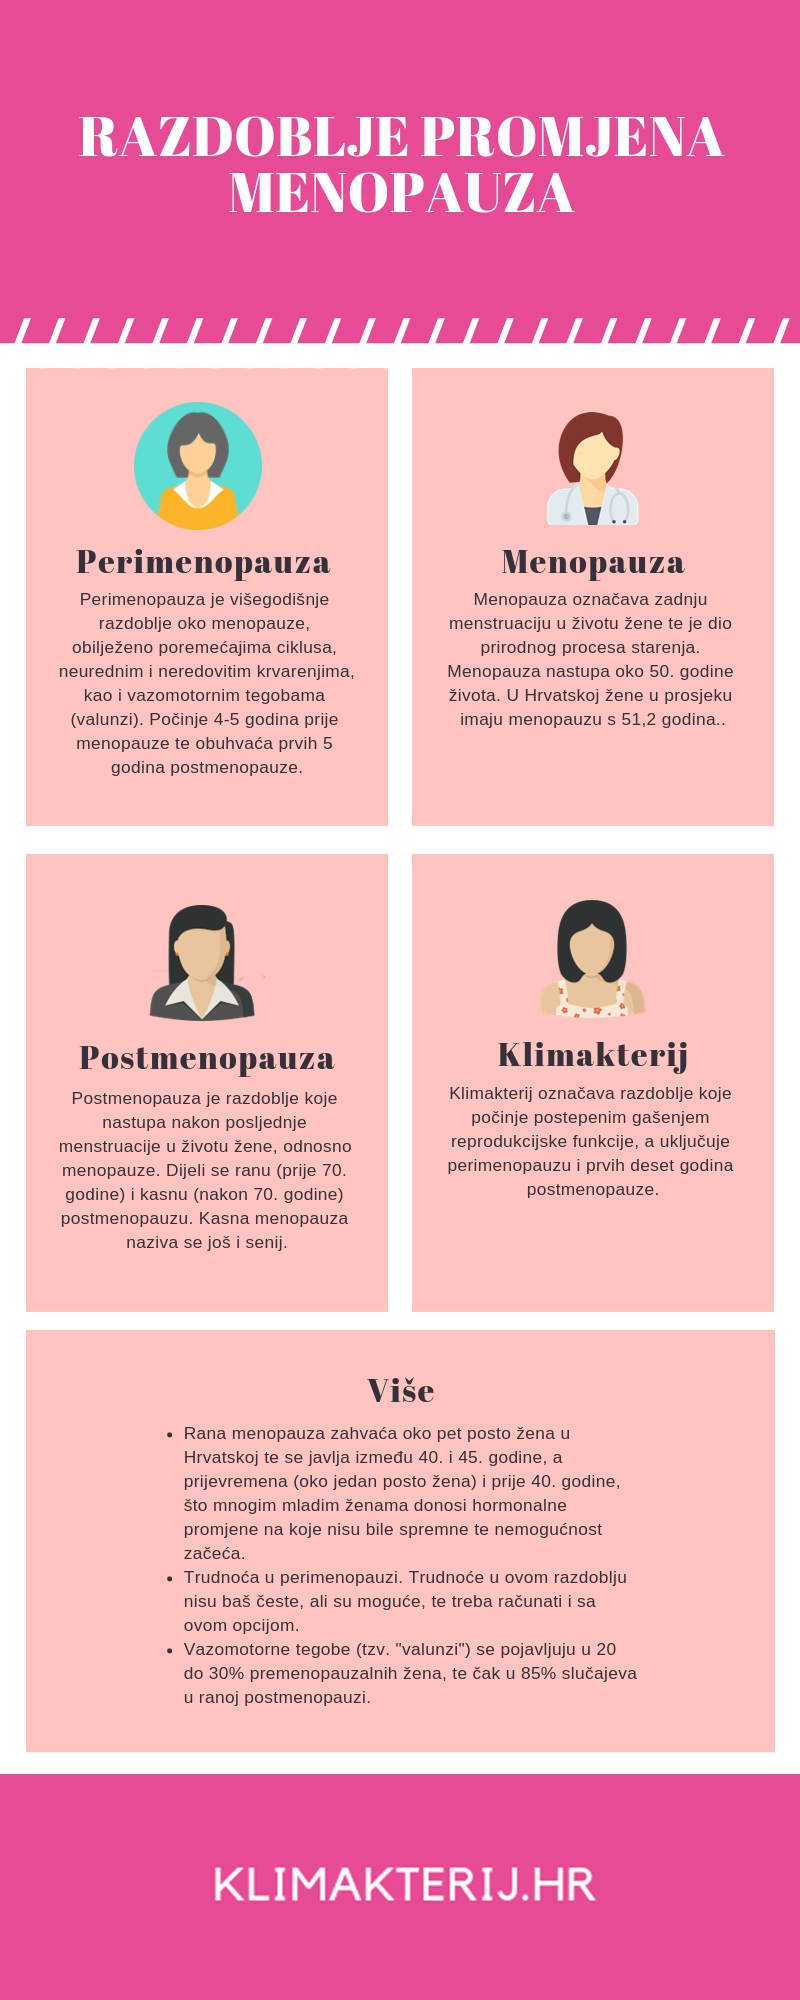 Razdoblje promjena menopauza